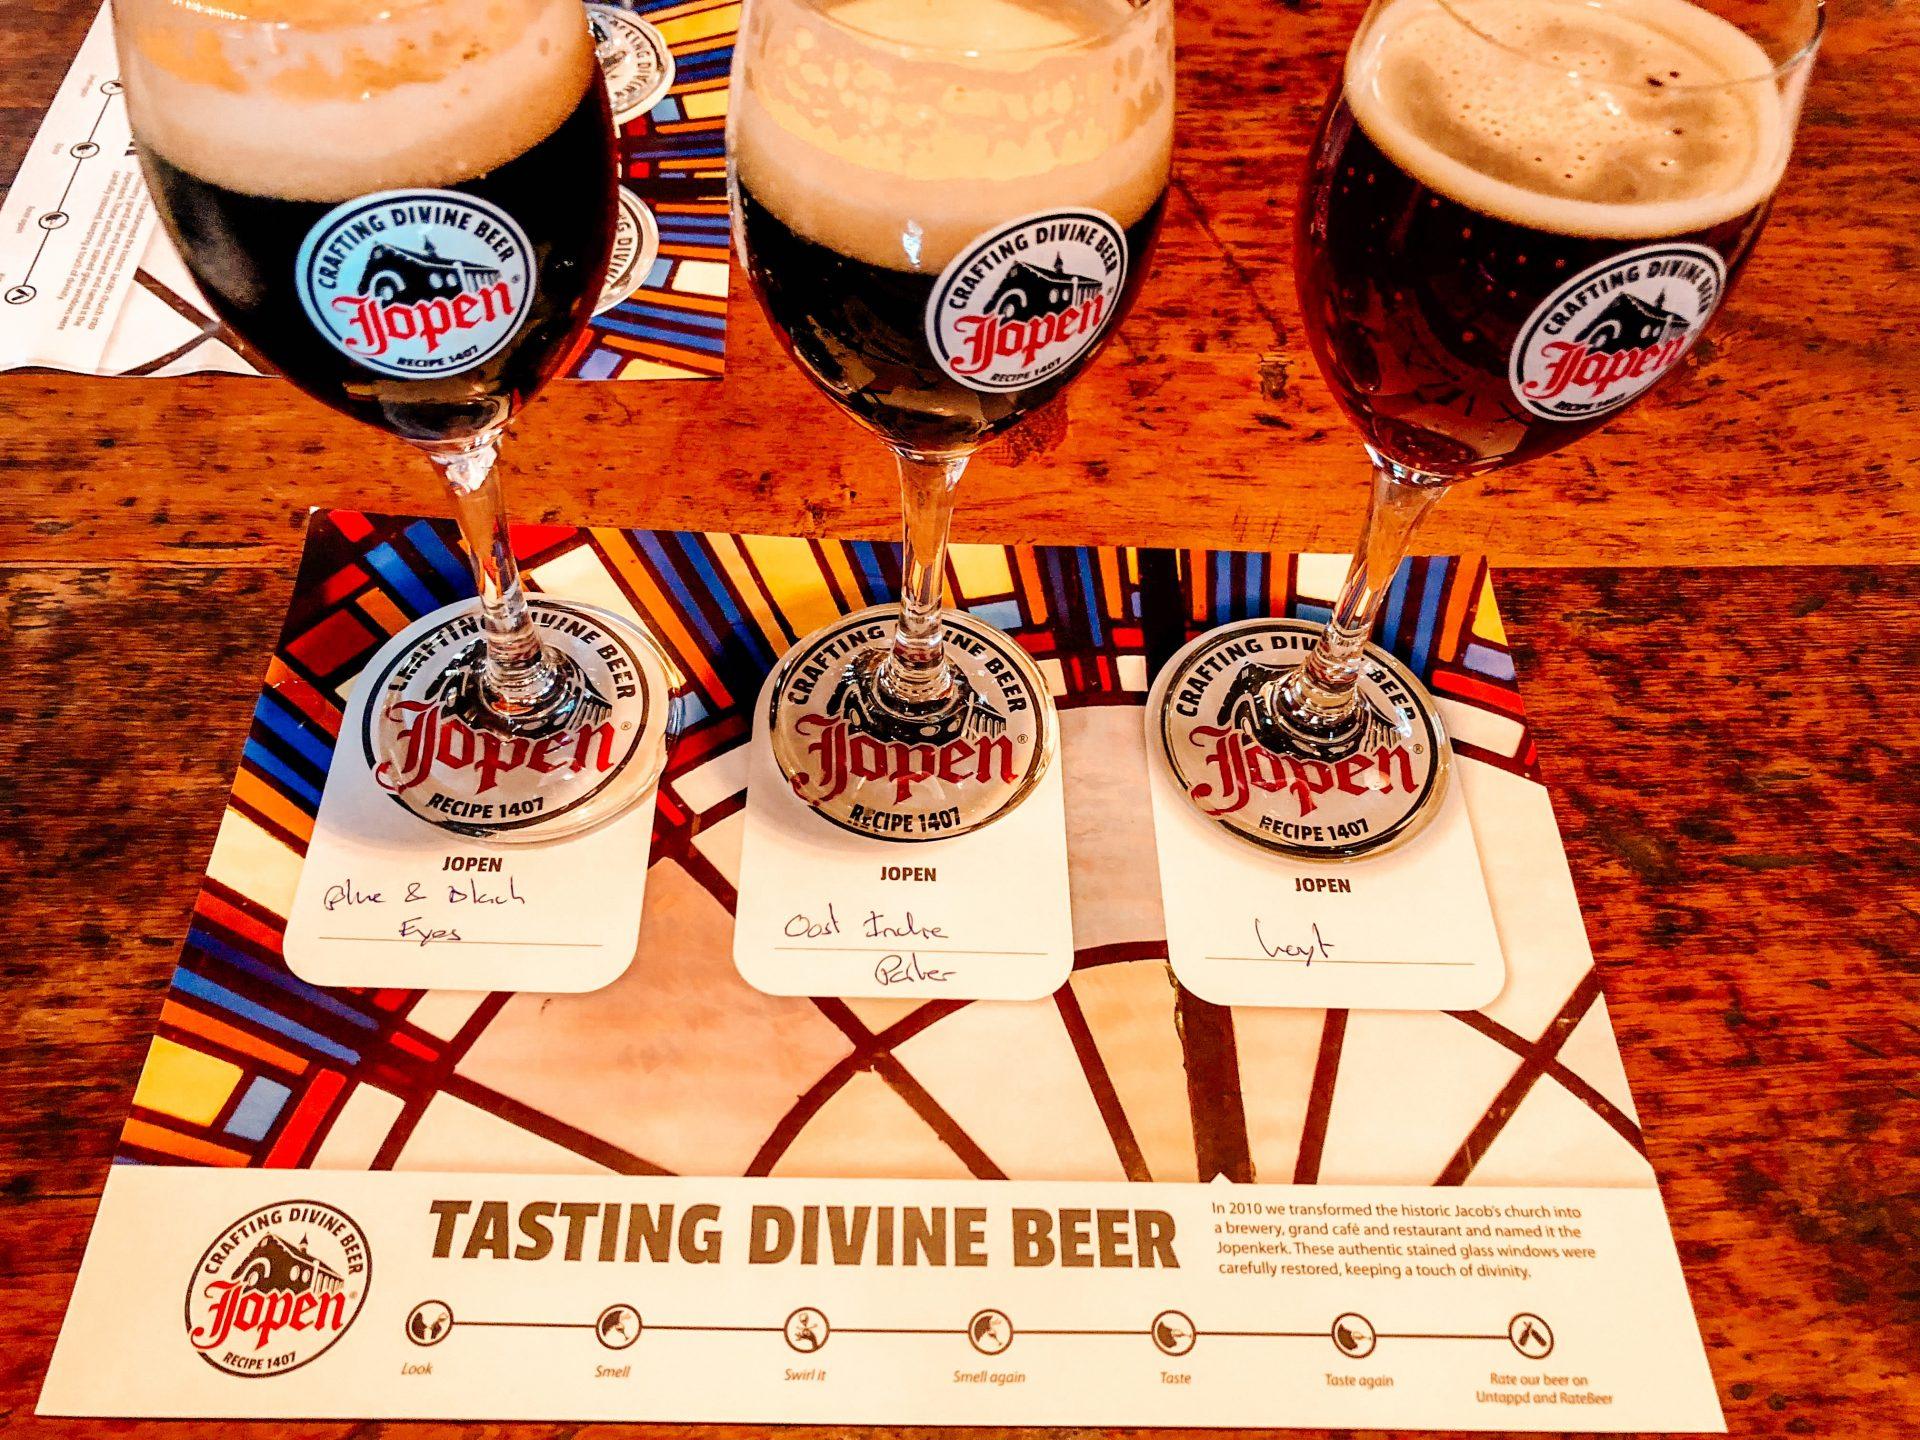 European Beer Travel Jopen Tasting Divine Beer three glasses of dark beer sitting on a card describing them.